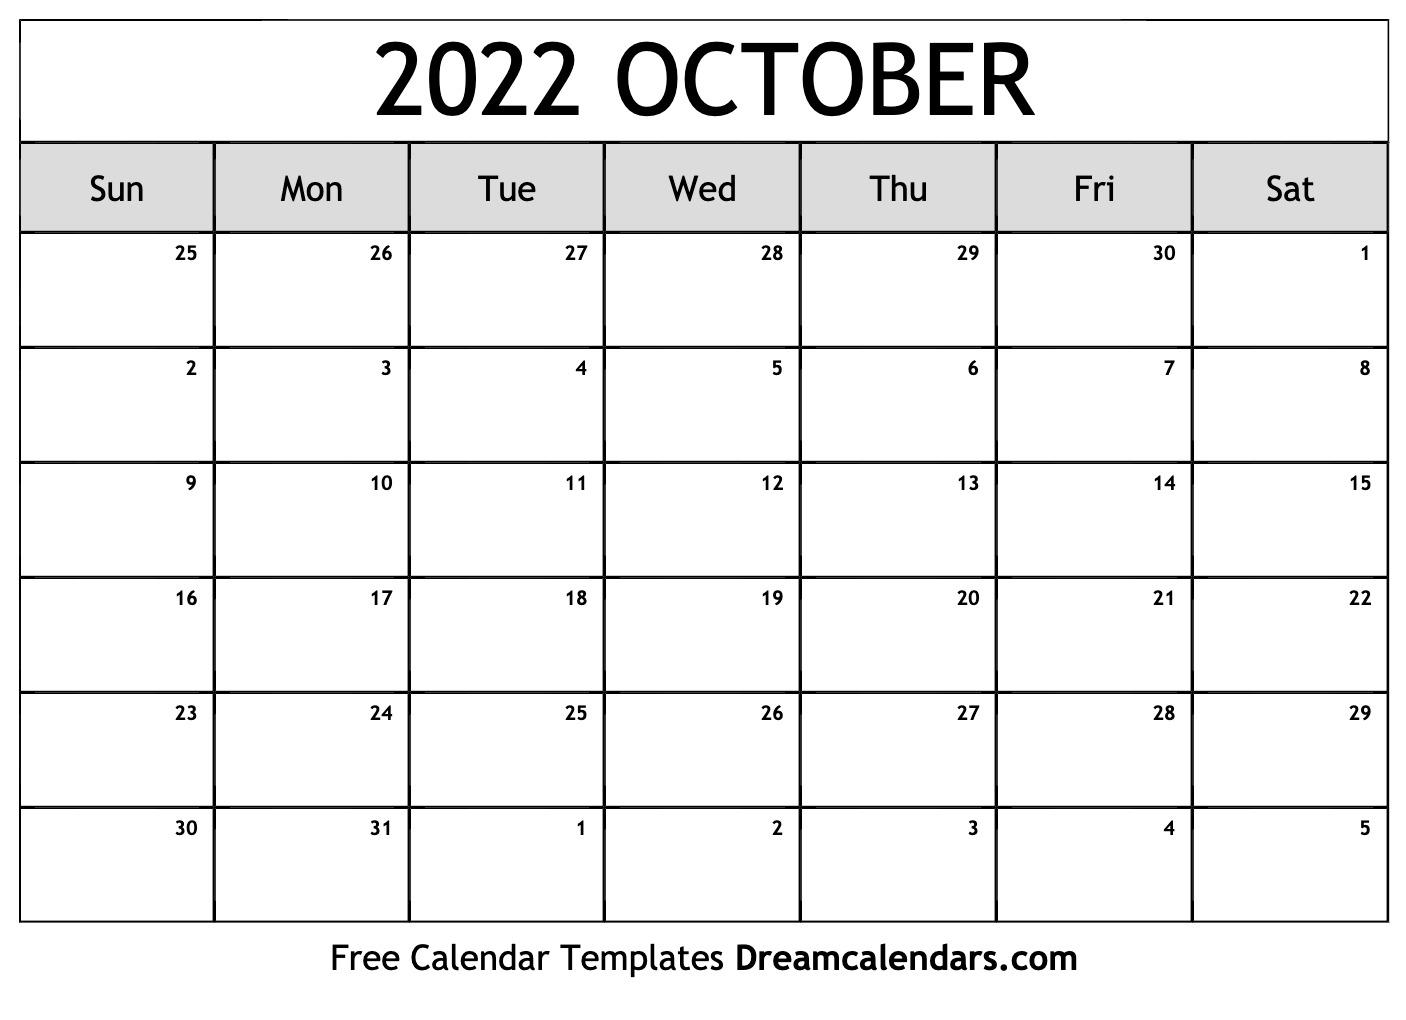 Free Printable Calendar October 2022.October 2022 Calendar Free Blank Printable Templates